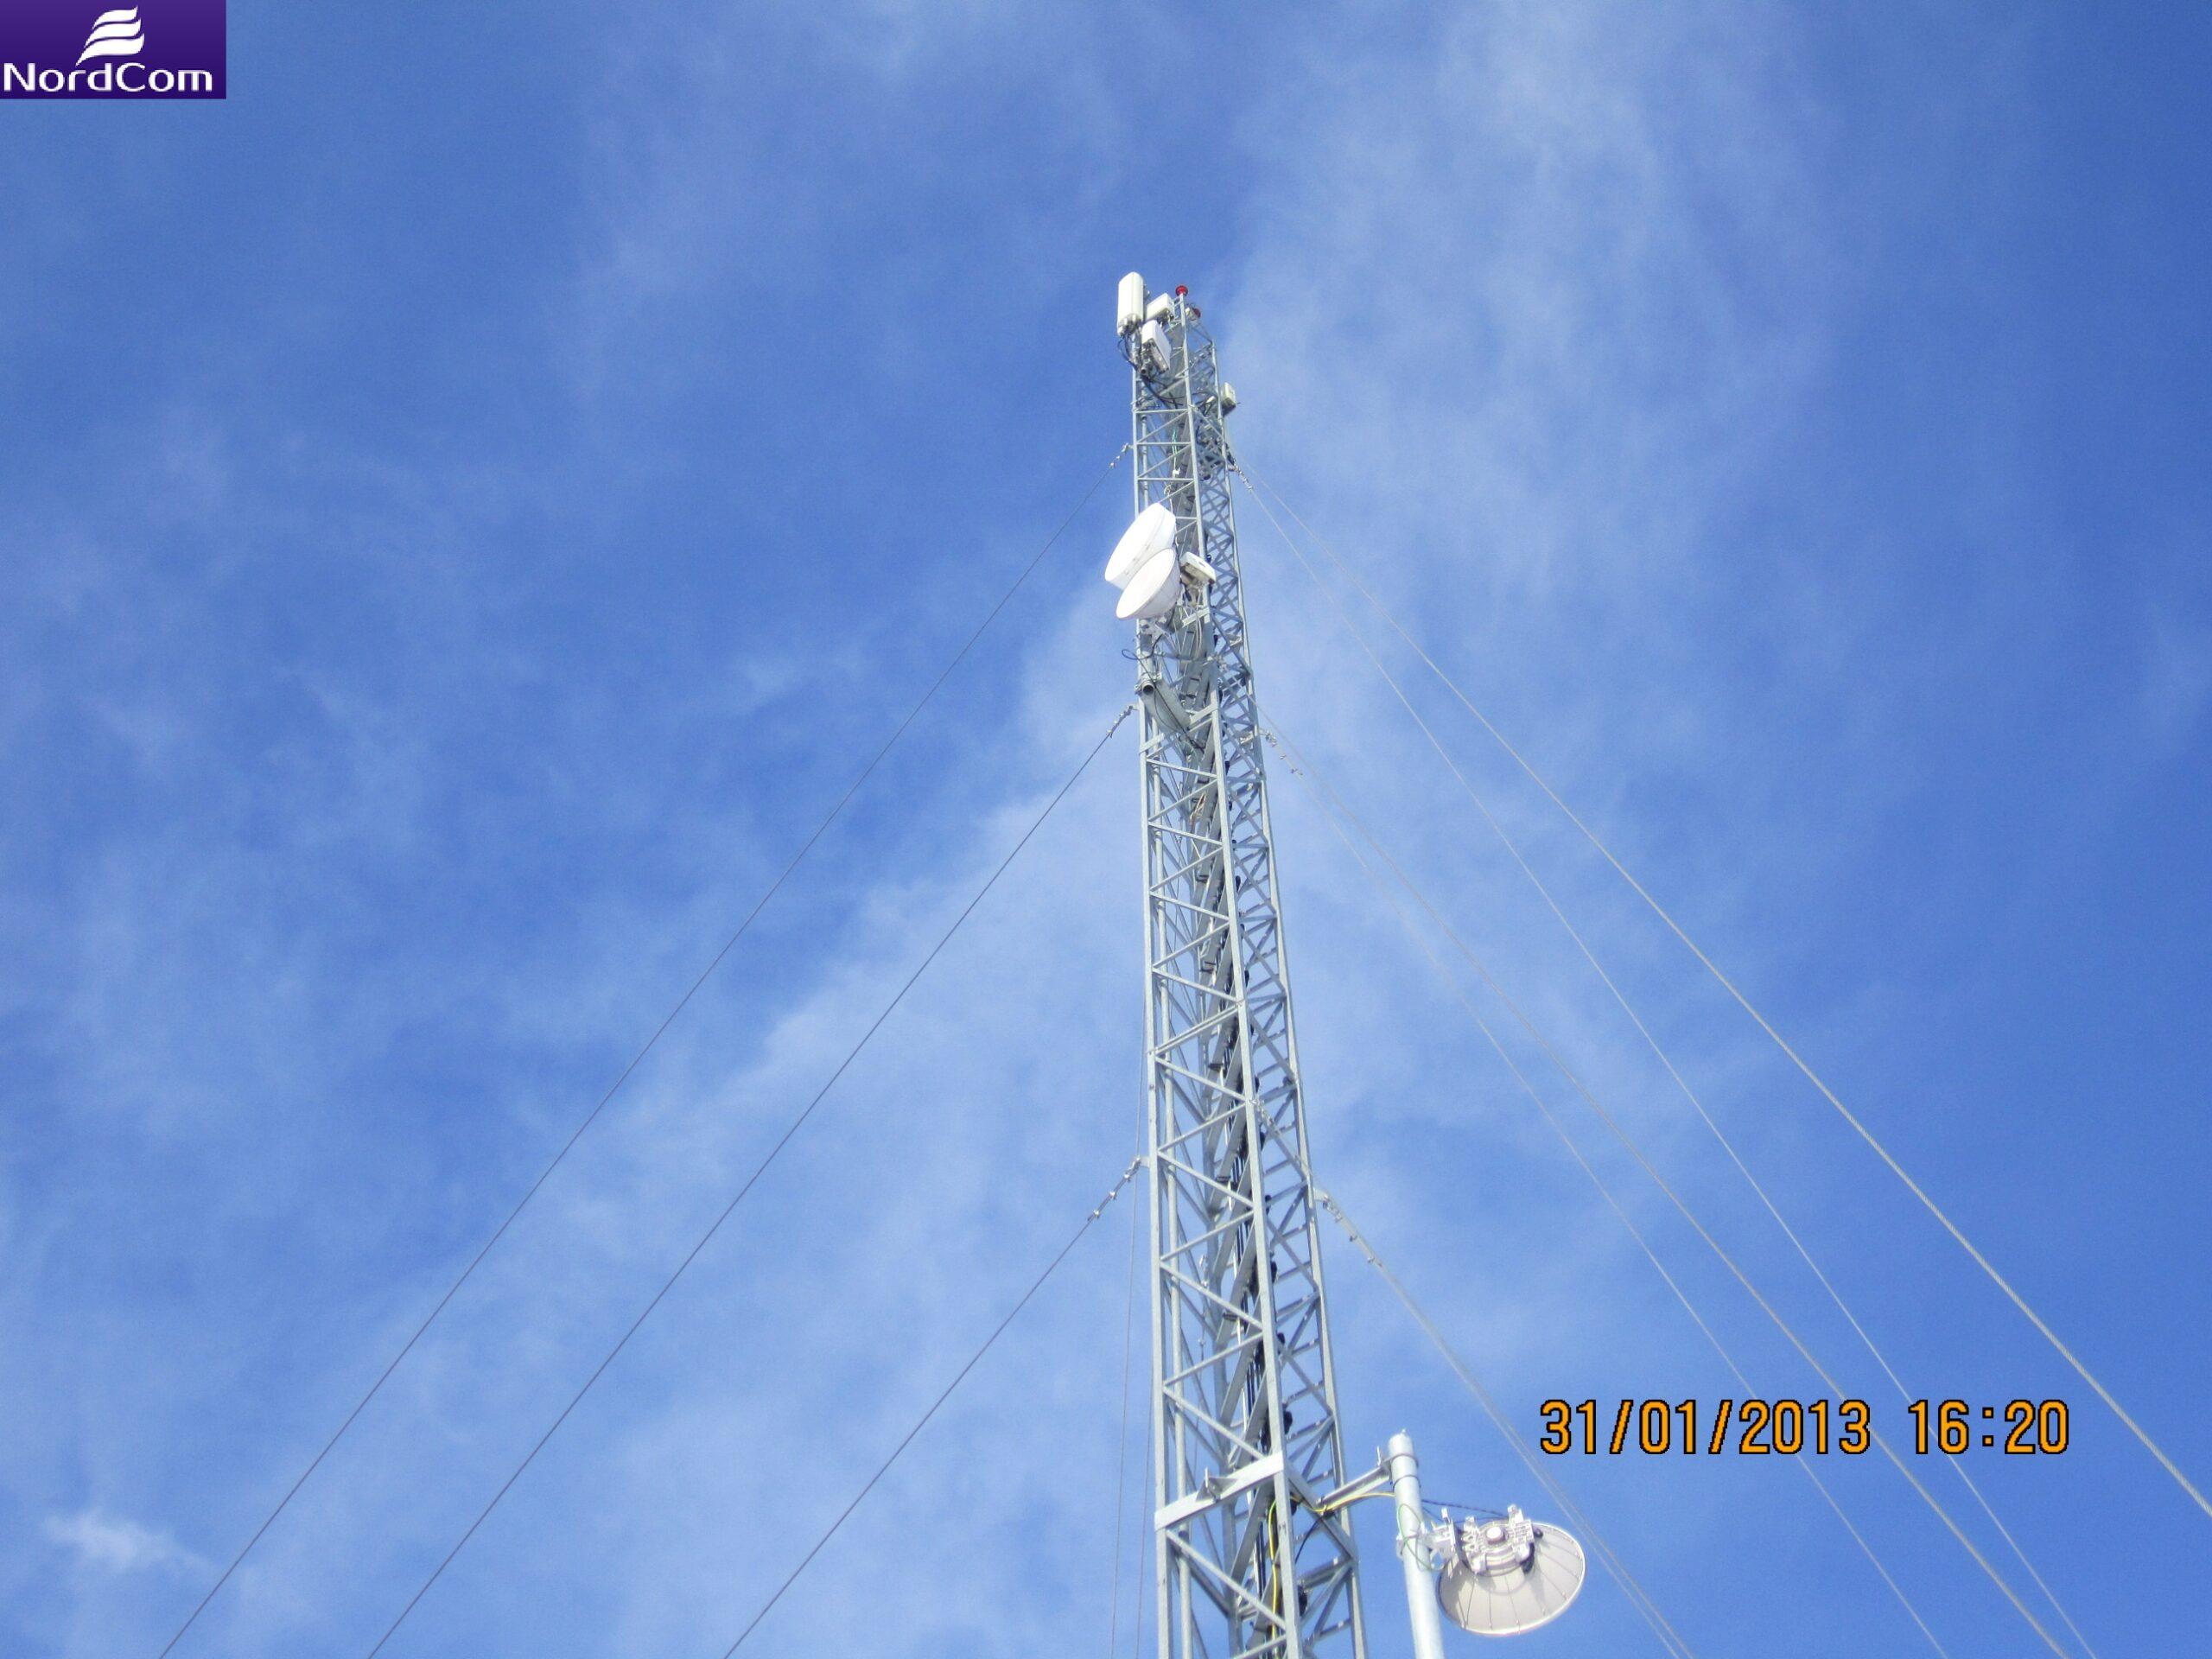 nordcom-spb-test-48